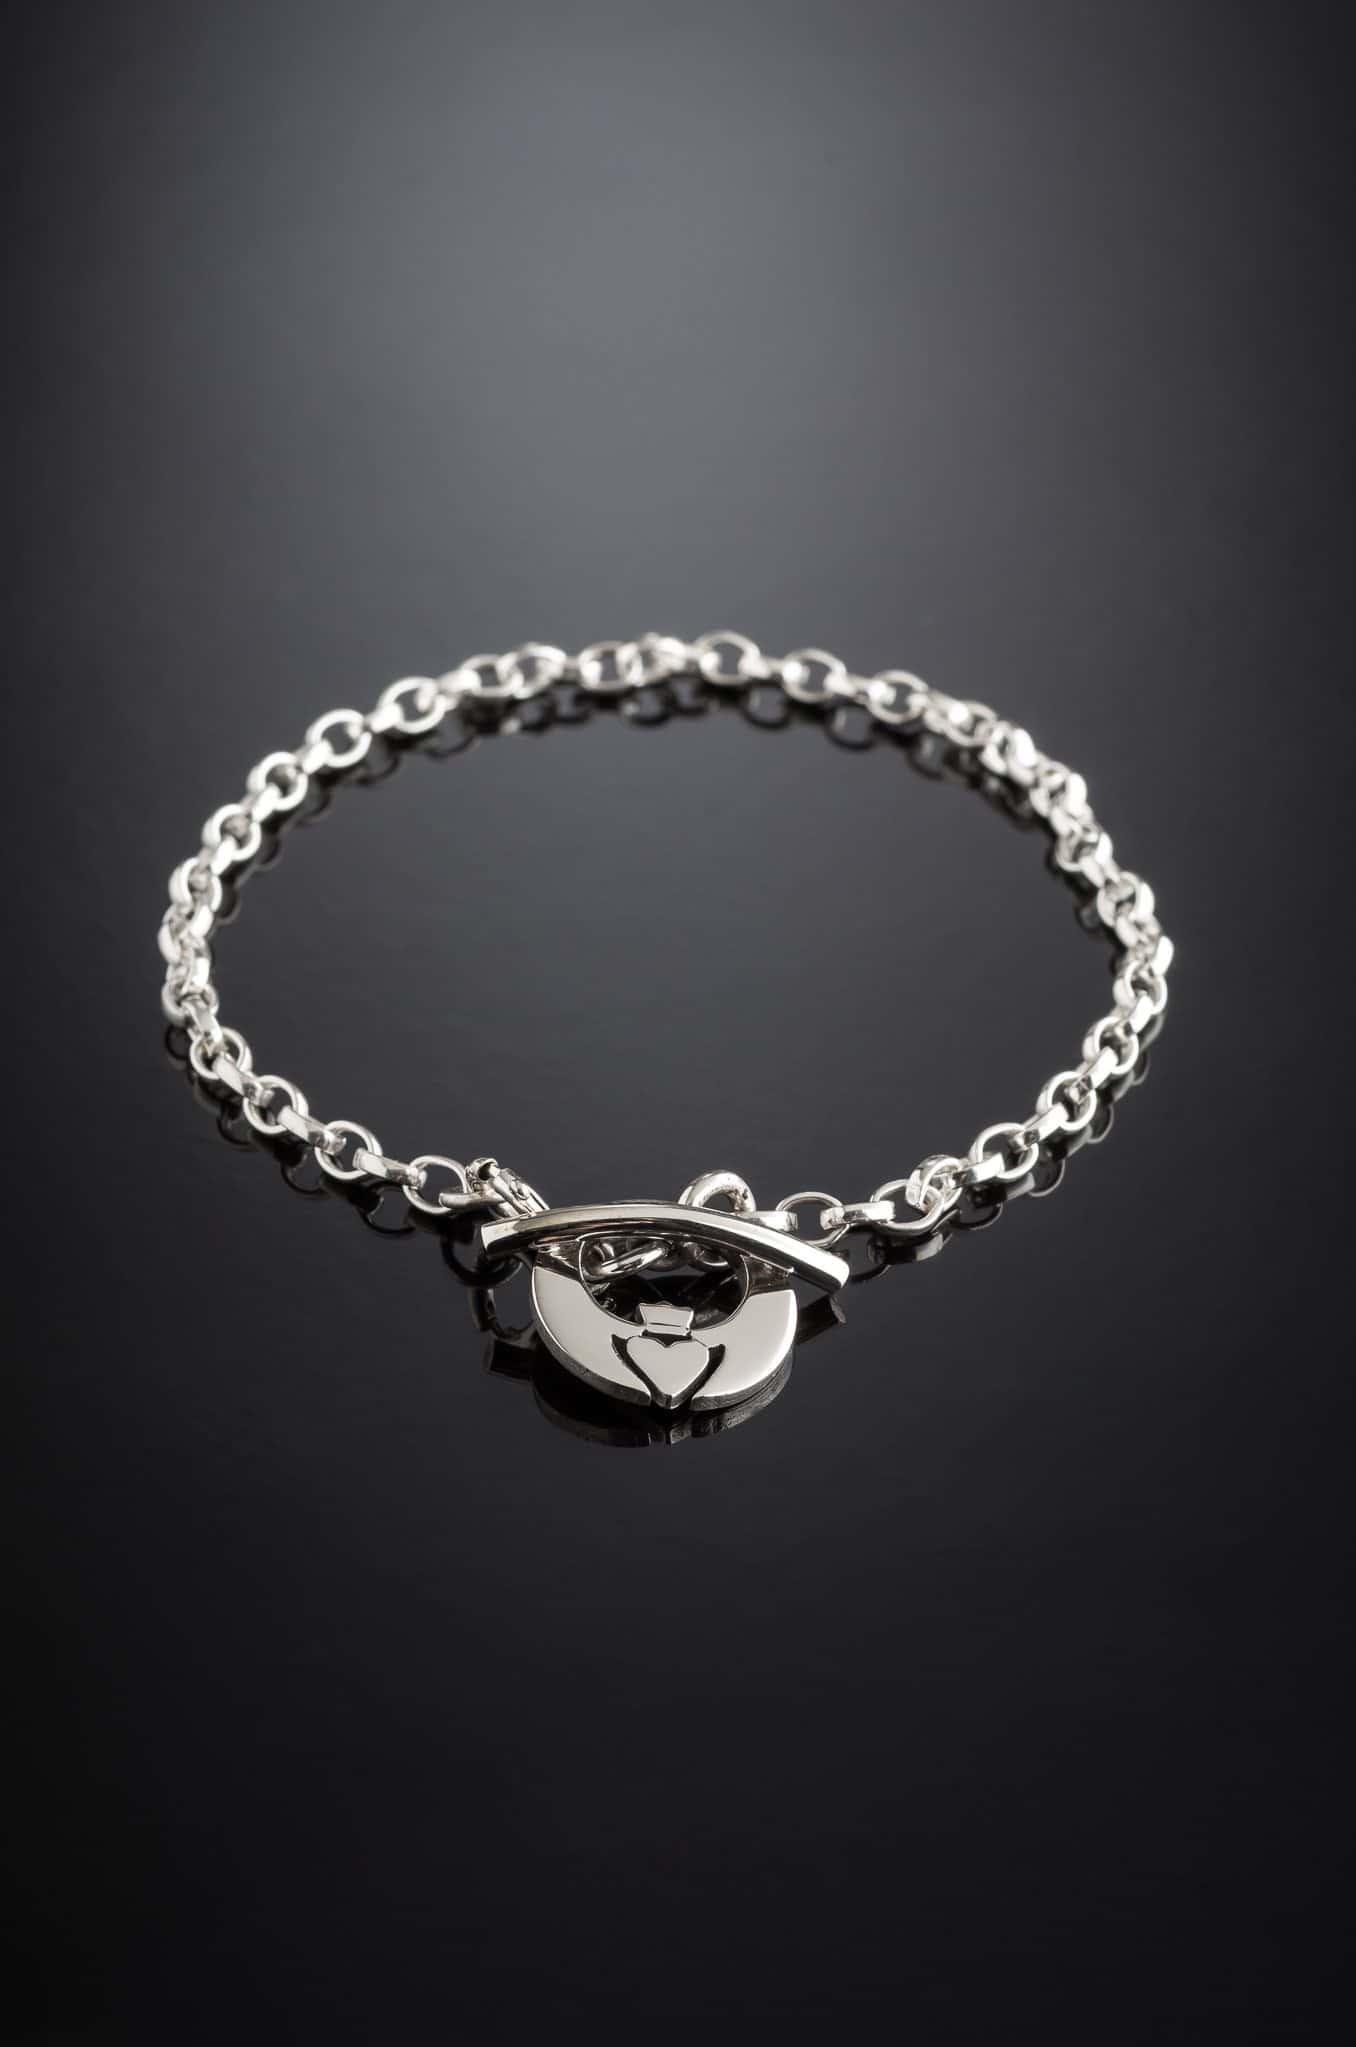 Irish Claddagh Sterling Silver Bracelet on a black background